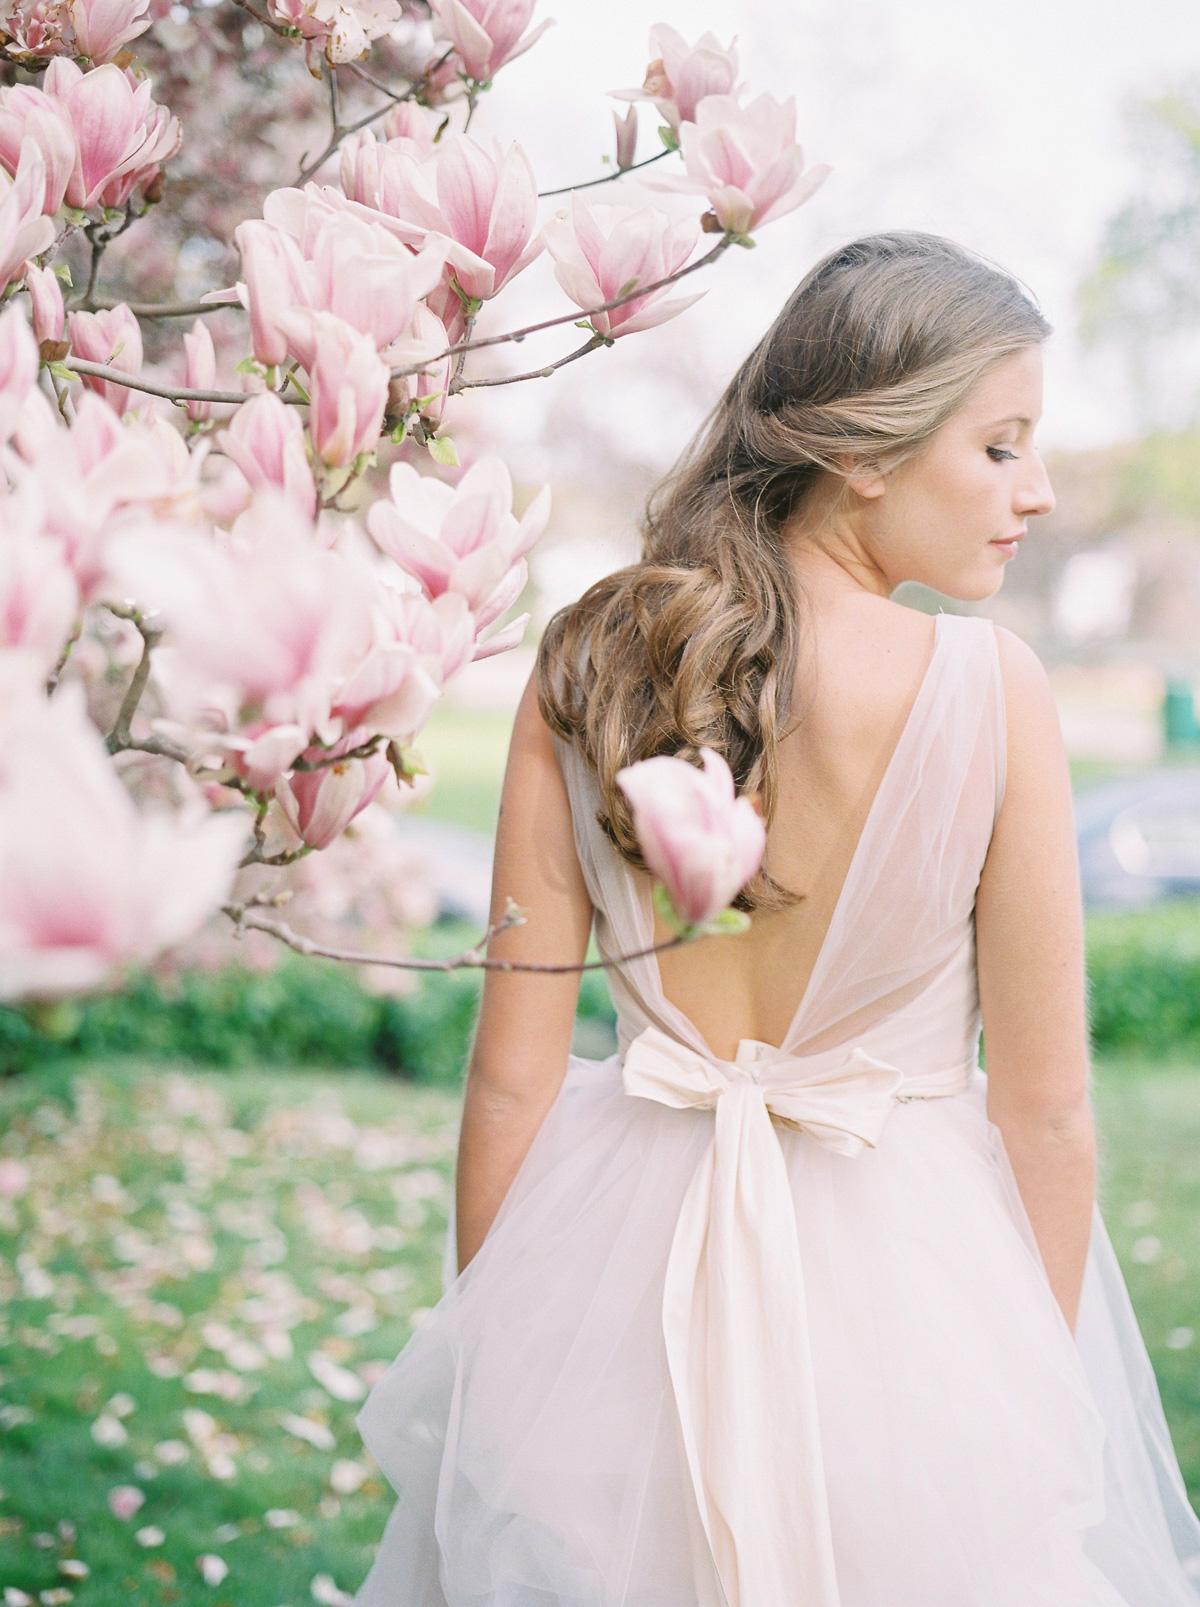 julia-park-photography-vineyard-bride-swish-list-niagara-on-the-lake-wedding-editorial-32.jpg